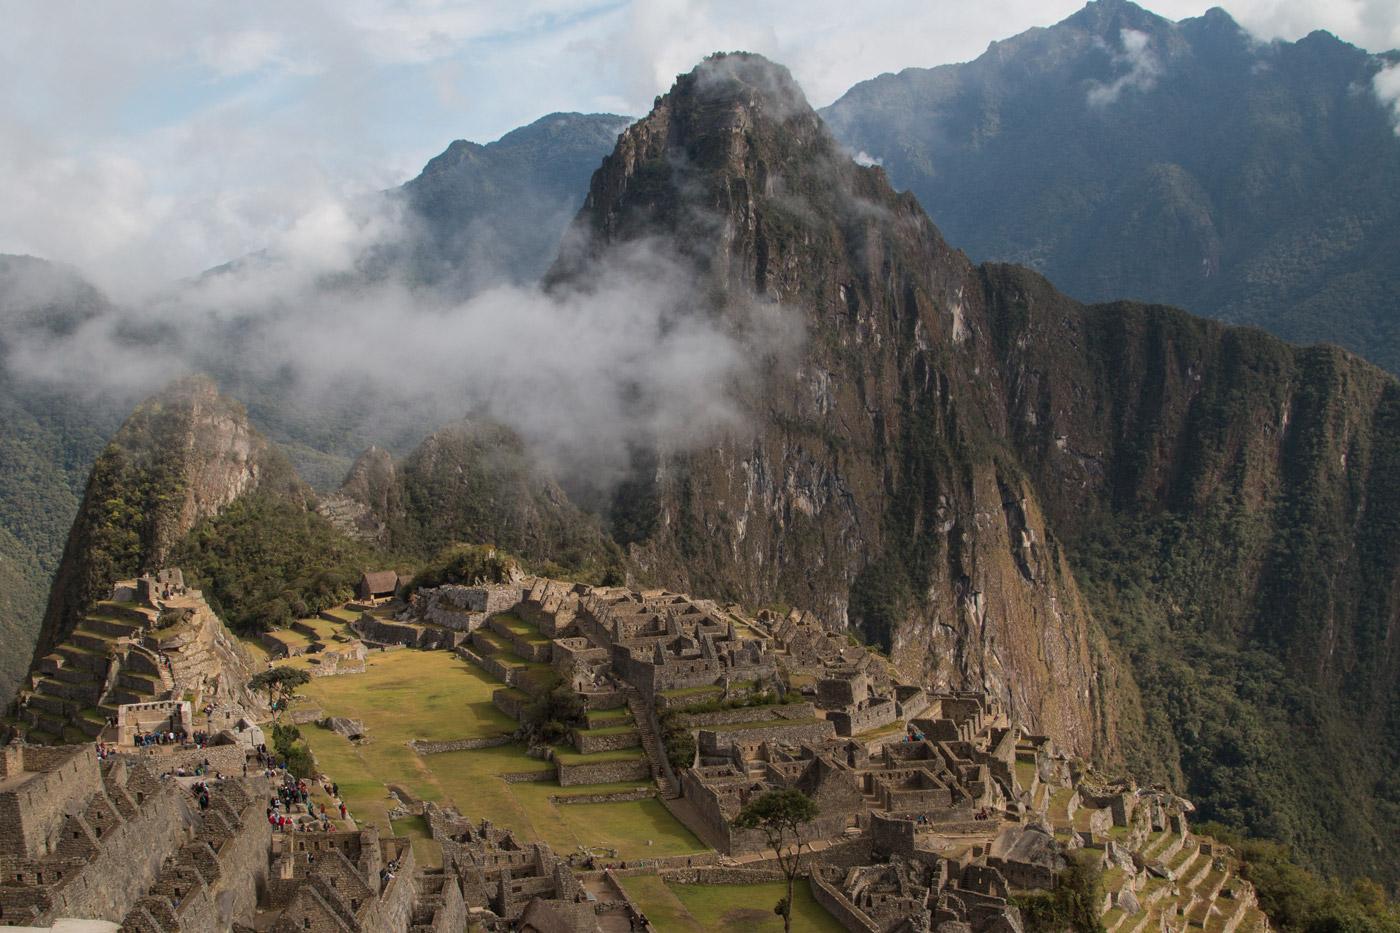 Postcard shot of Machu Picchu